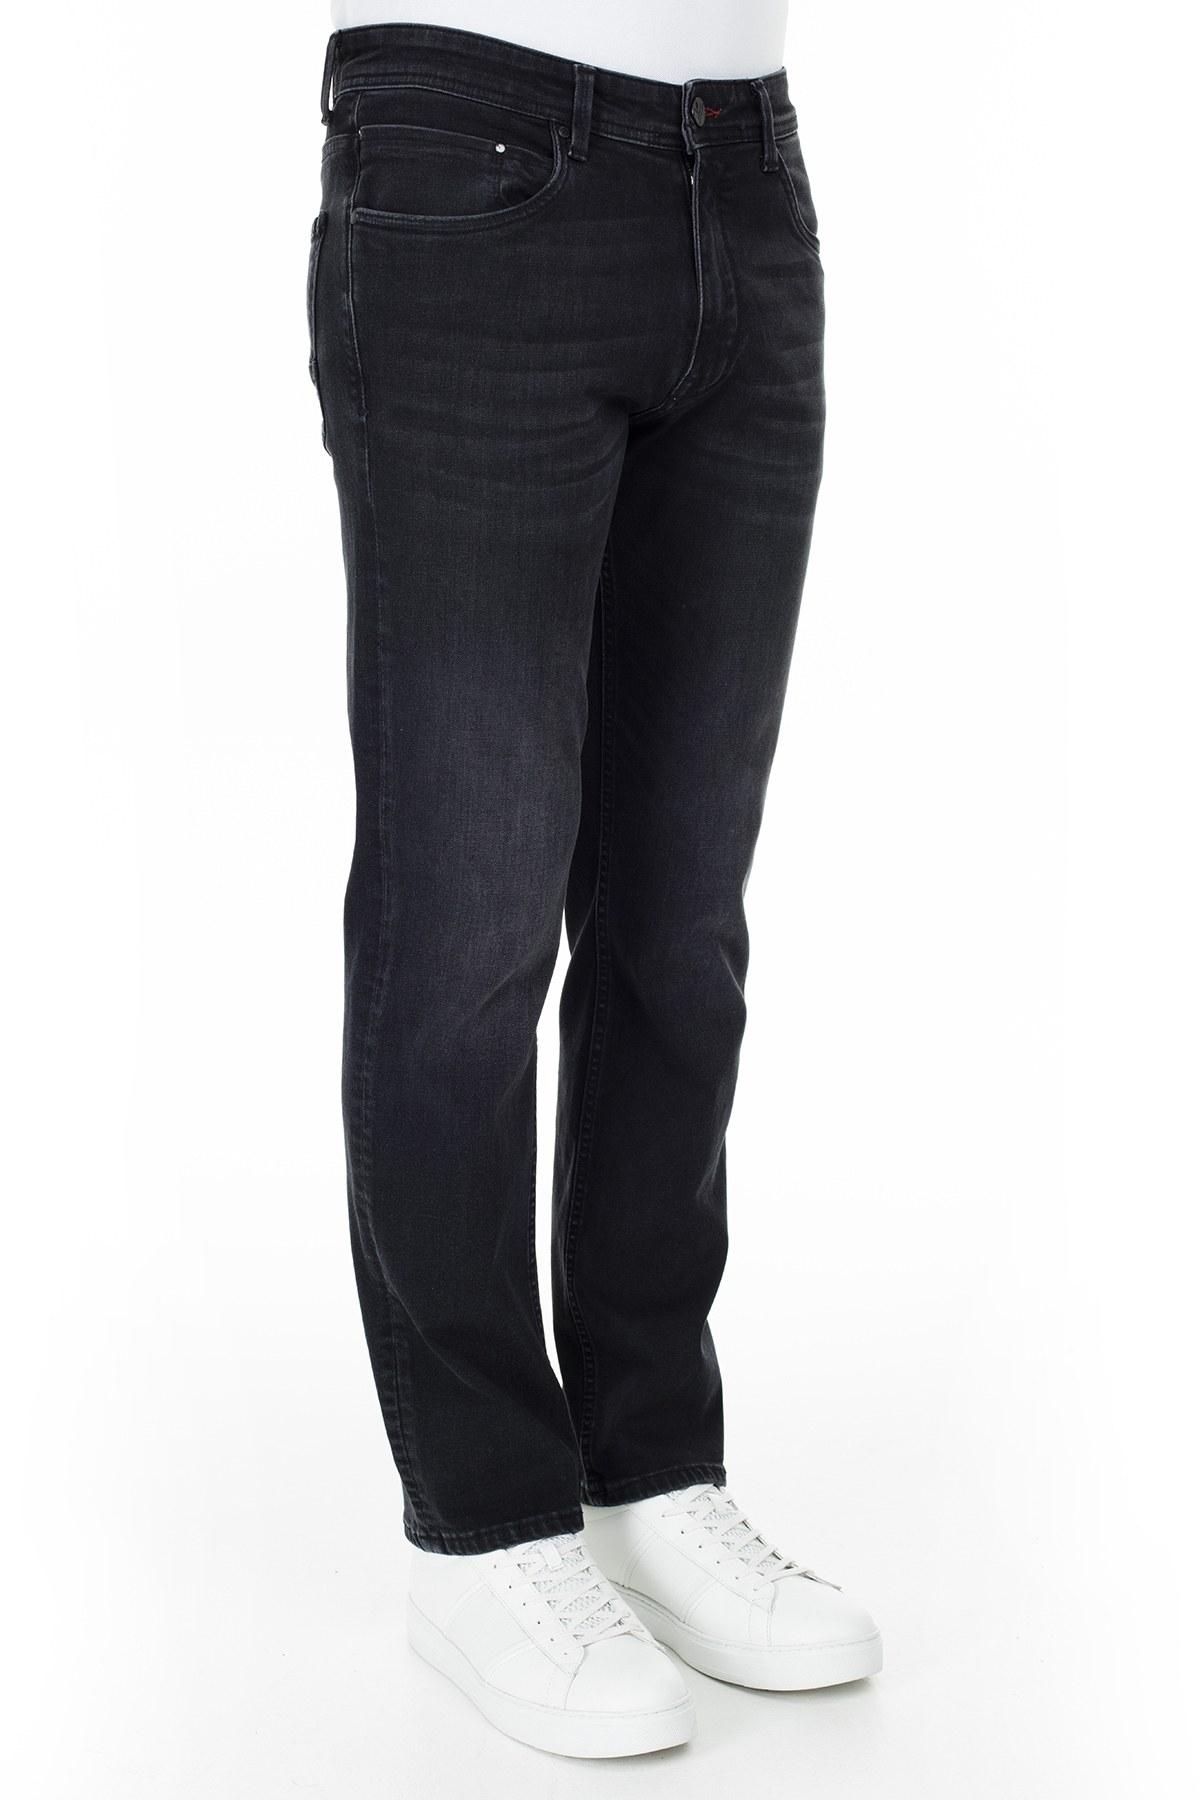 Exxe Jeans Erkek Kot Pantolon 7400H879KING SİYAH